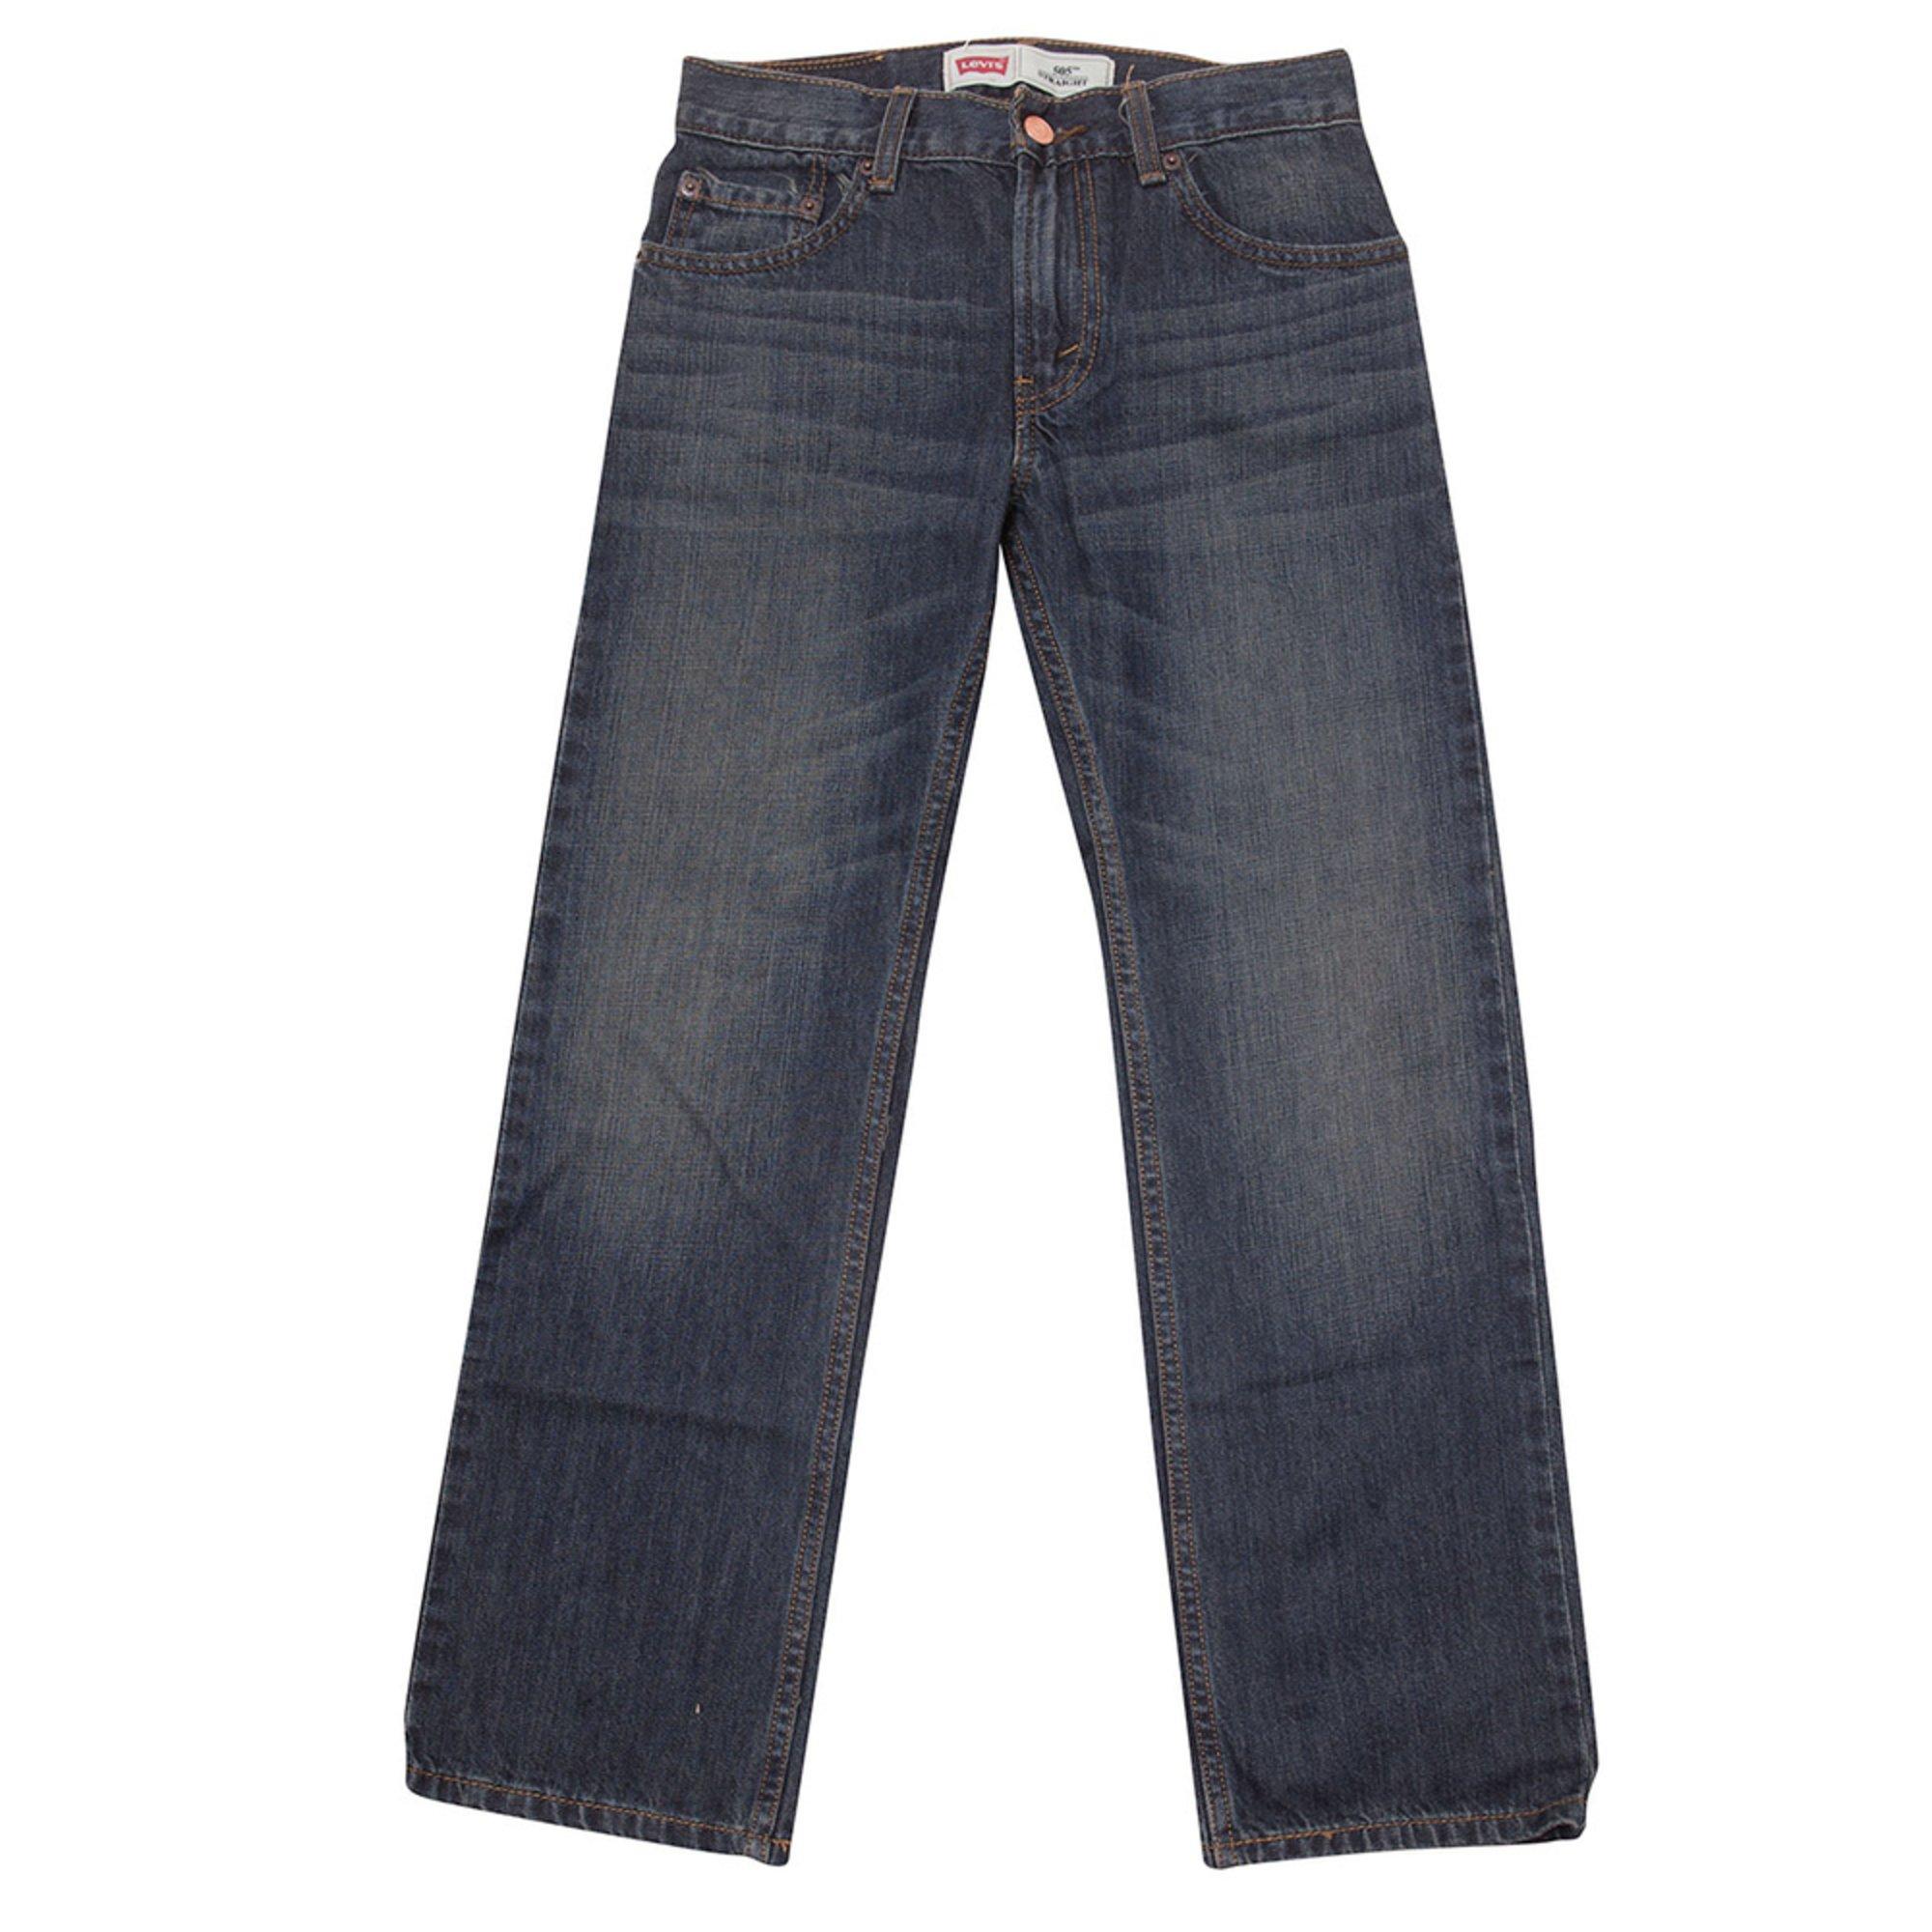 Levi's Big Boys' 505 Regular Roadie Jeans | Big Boys ... - photo #29